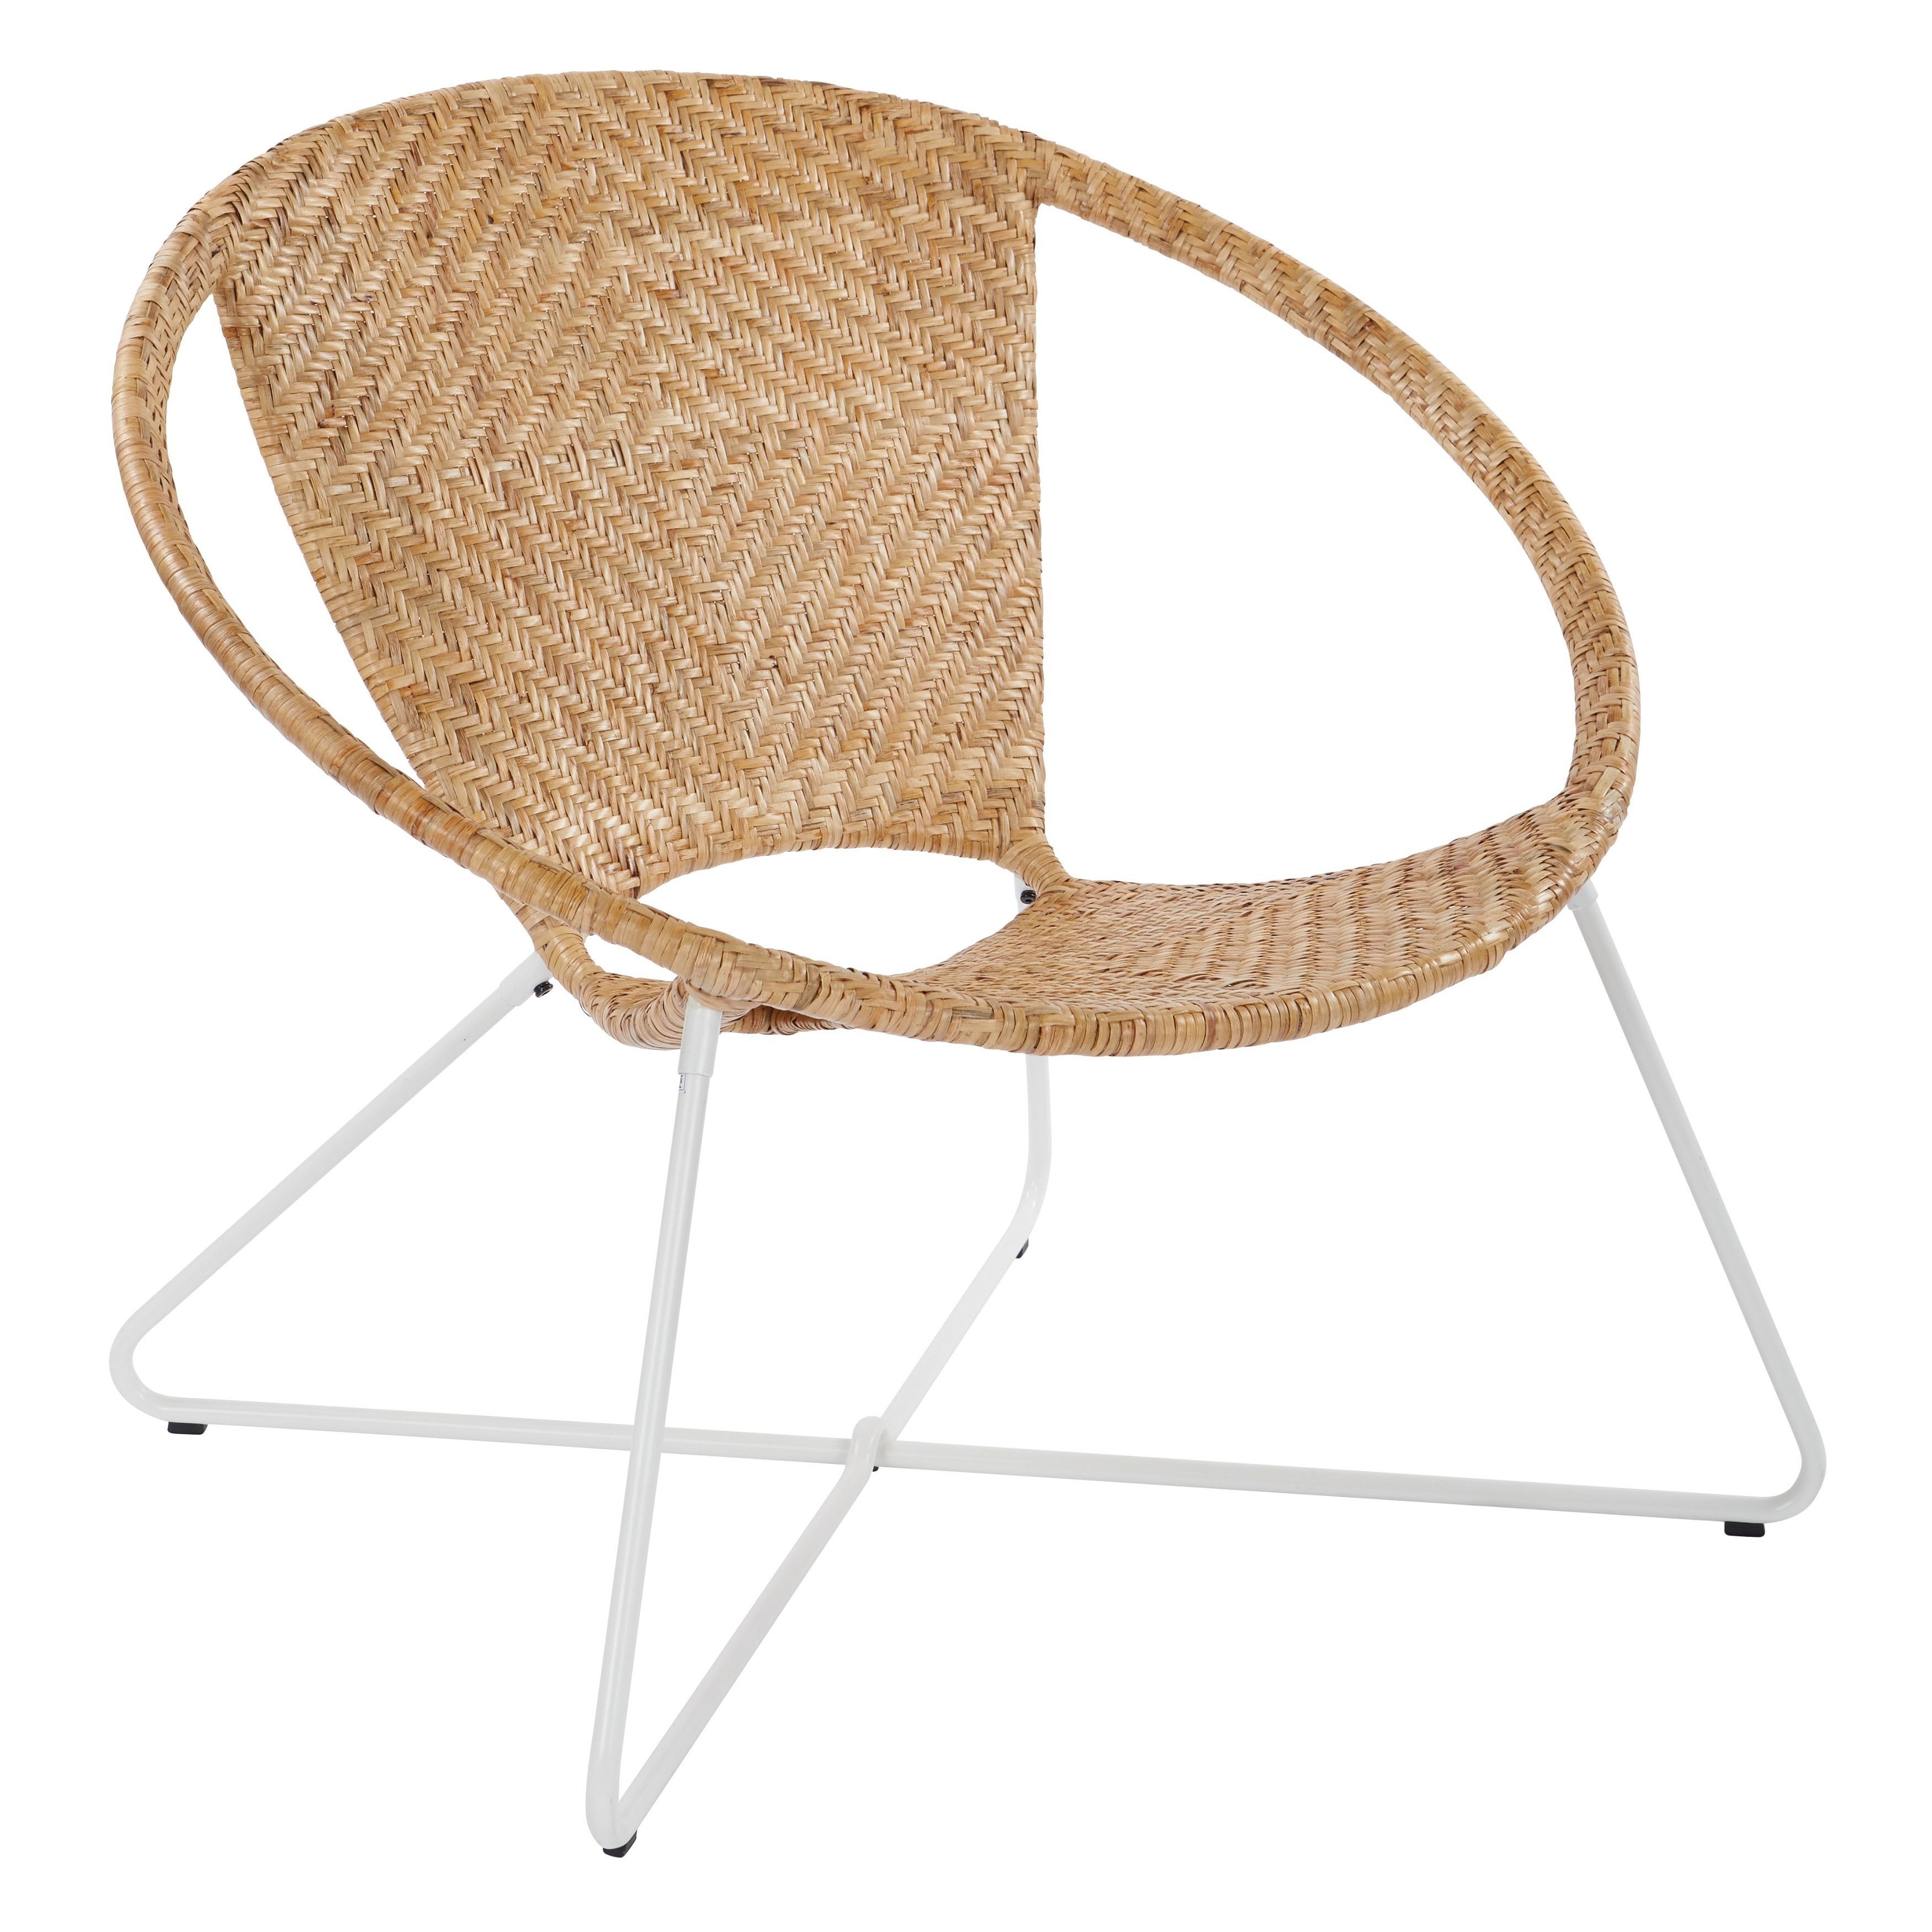 Osp home furnishings navarre woven rattan lounge chair